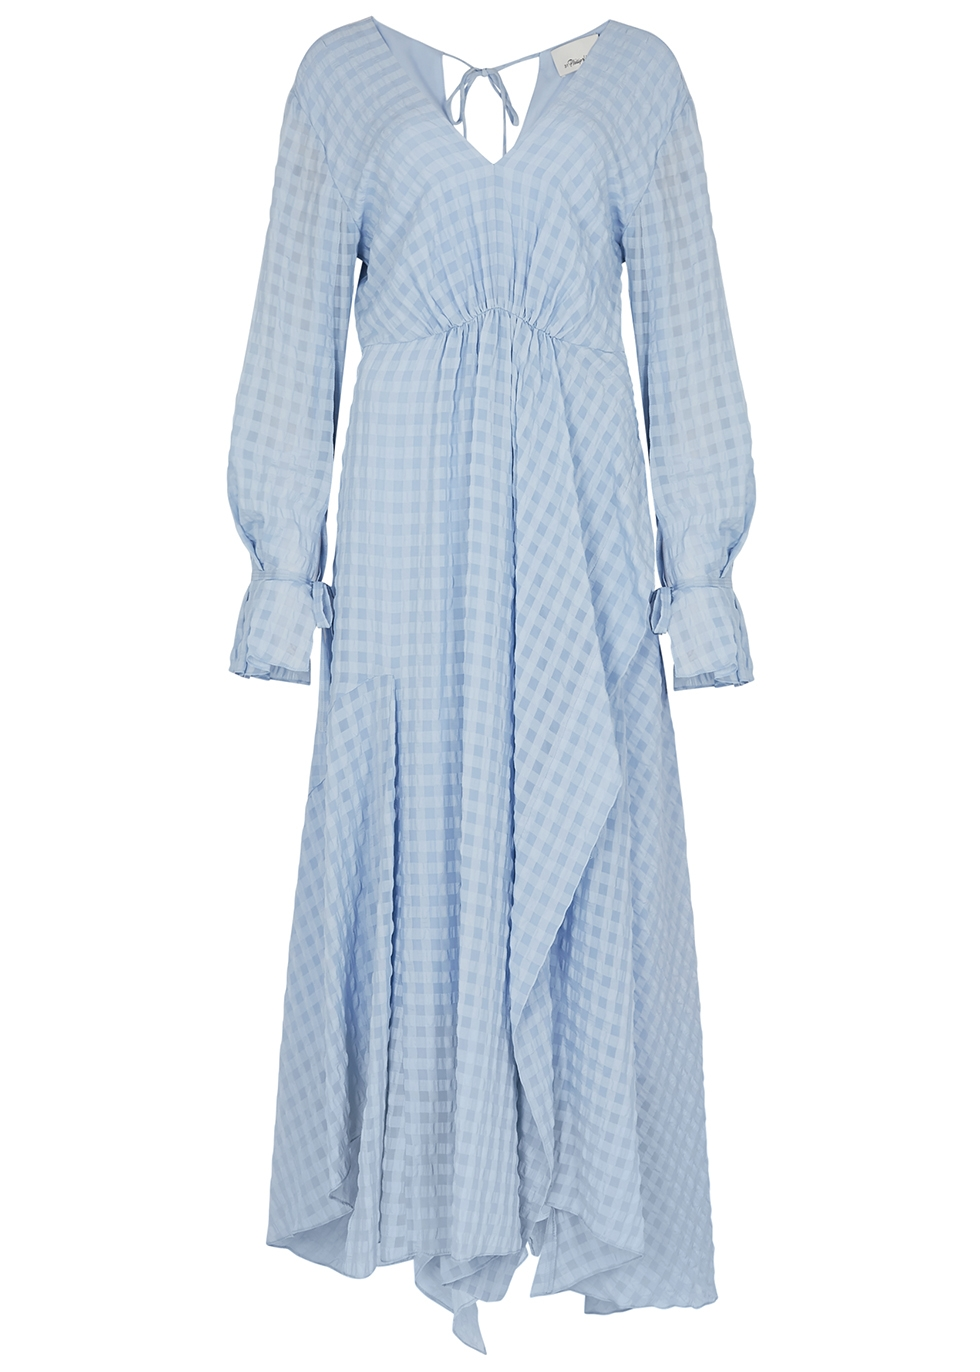 6b11c83bf76 Designer Dresses   Designer Gowns - Harvey Nichols